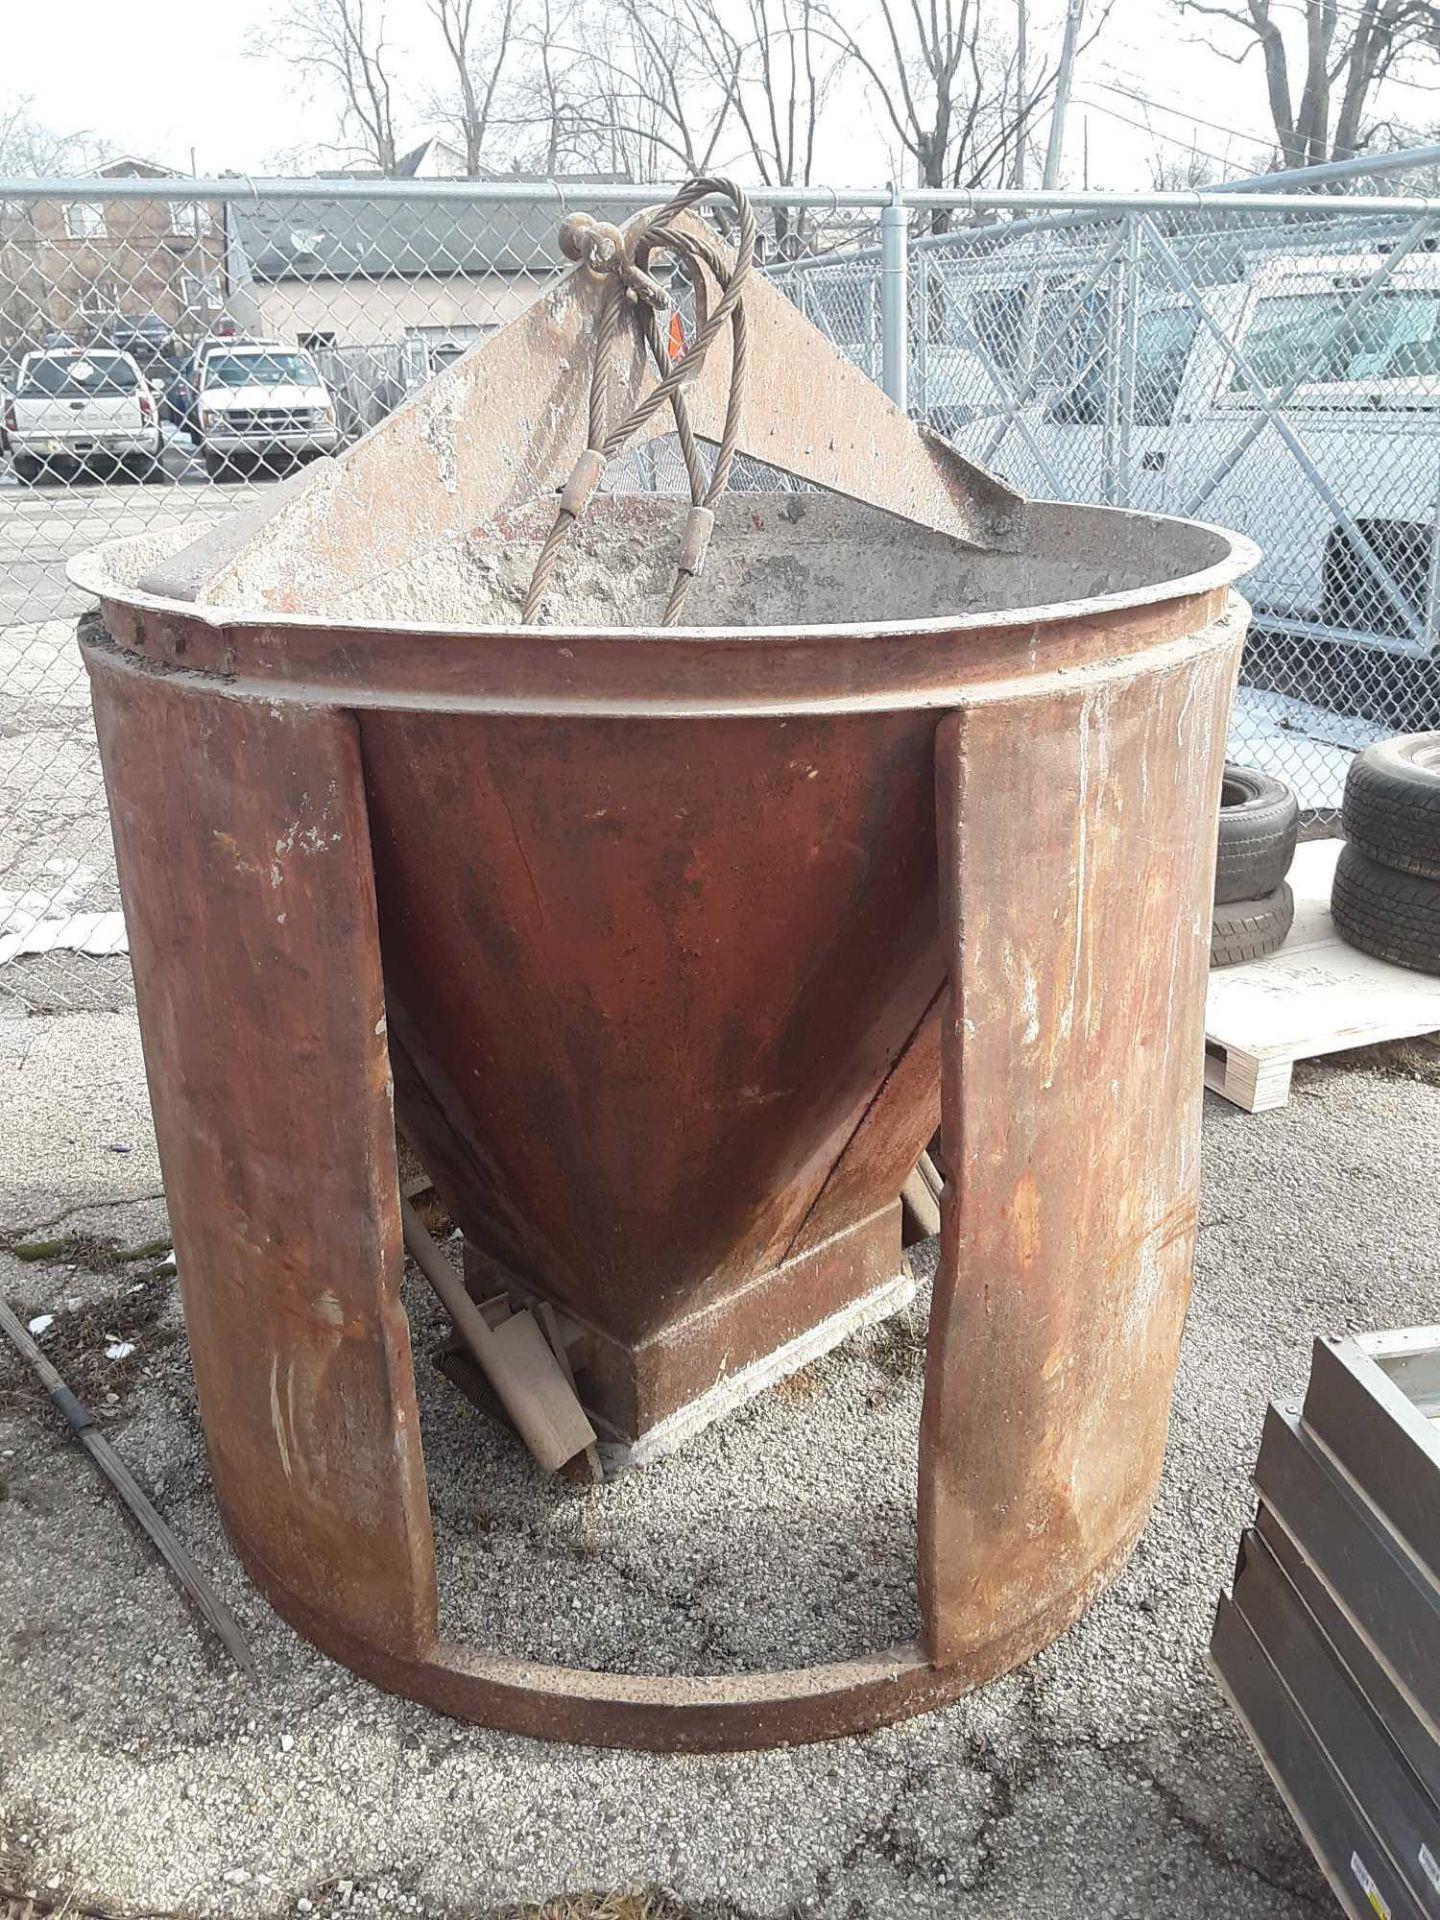 Lot 59 - Concrete Bucket